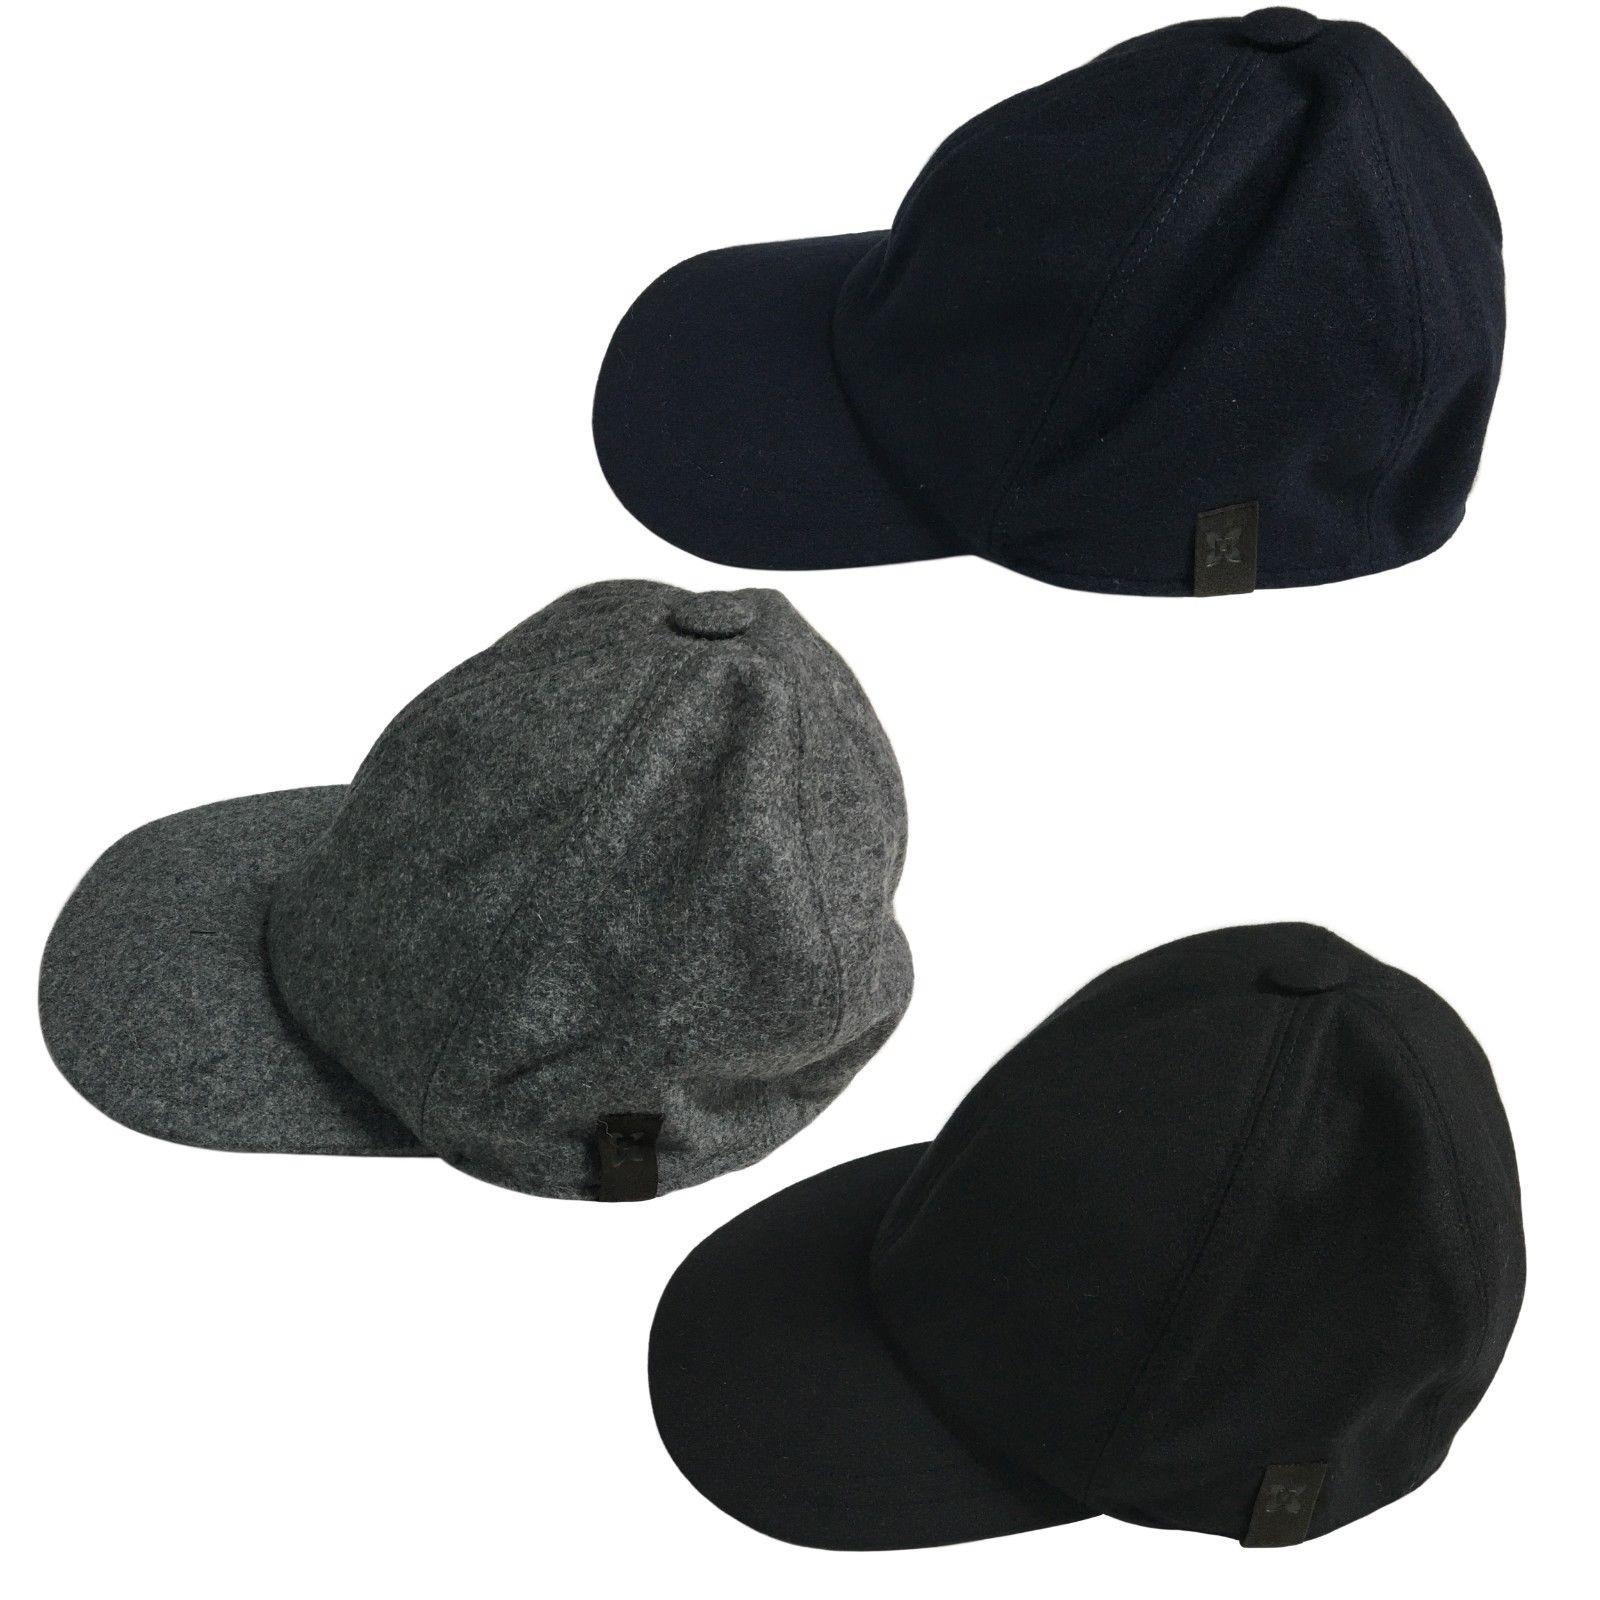 FERRANTE cappello uomo lana con visiera mod U17100 BASEBALL MADE IN ITALY  c41c997b6d09